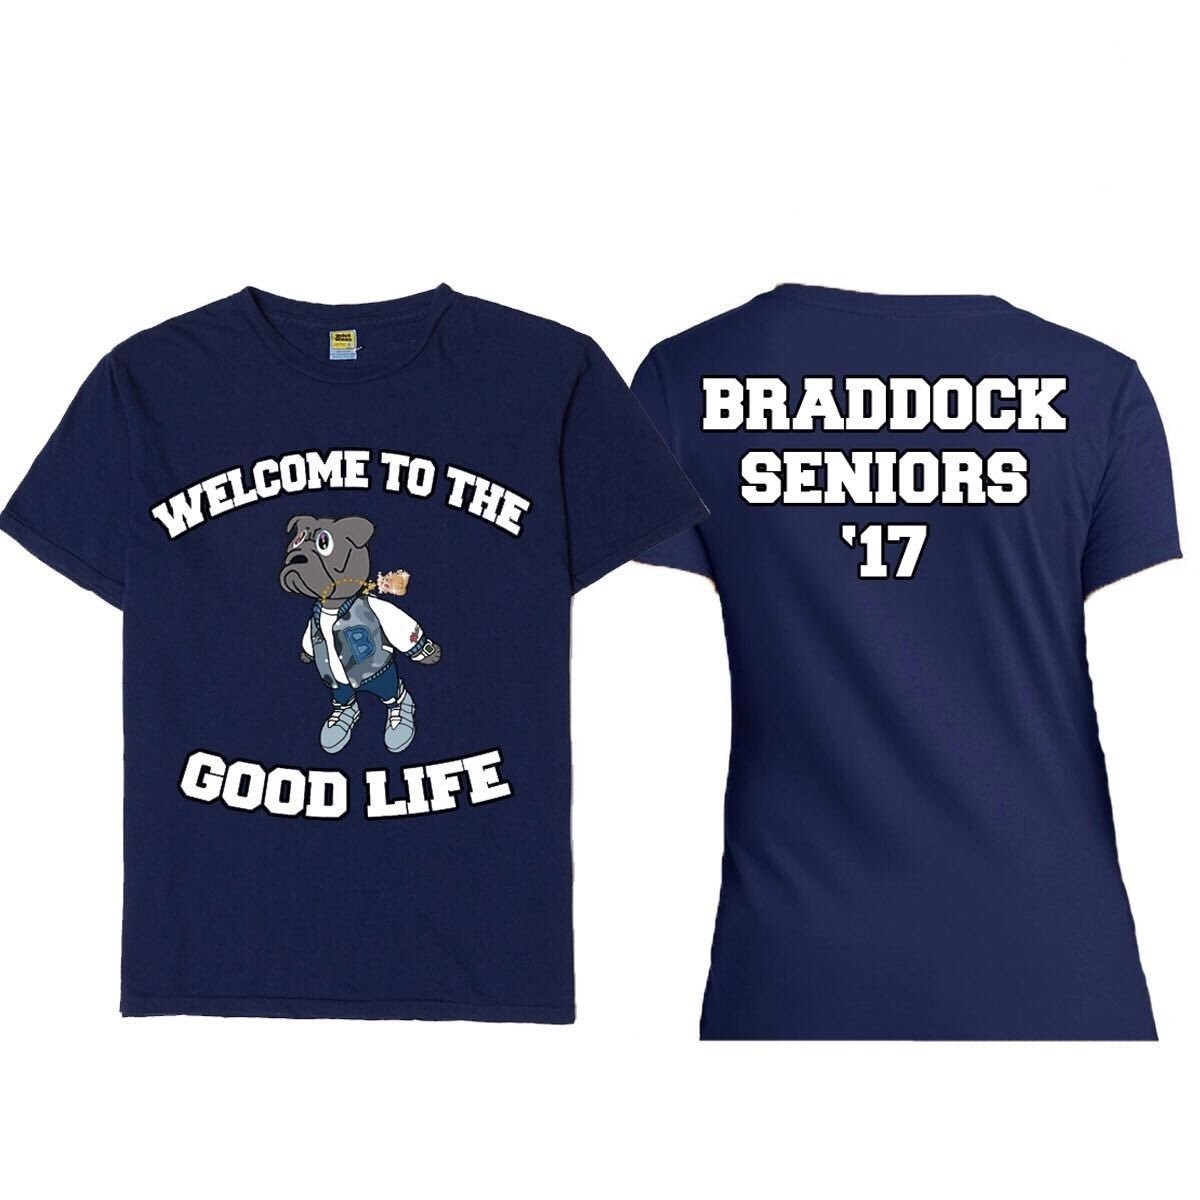 10 Stunning Class Of 2016 Shirt Ideas braddock activities on twitter senior shirt for class of 17 vote